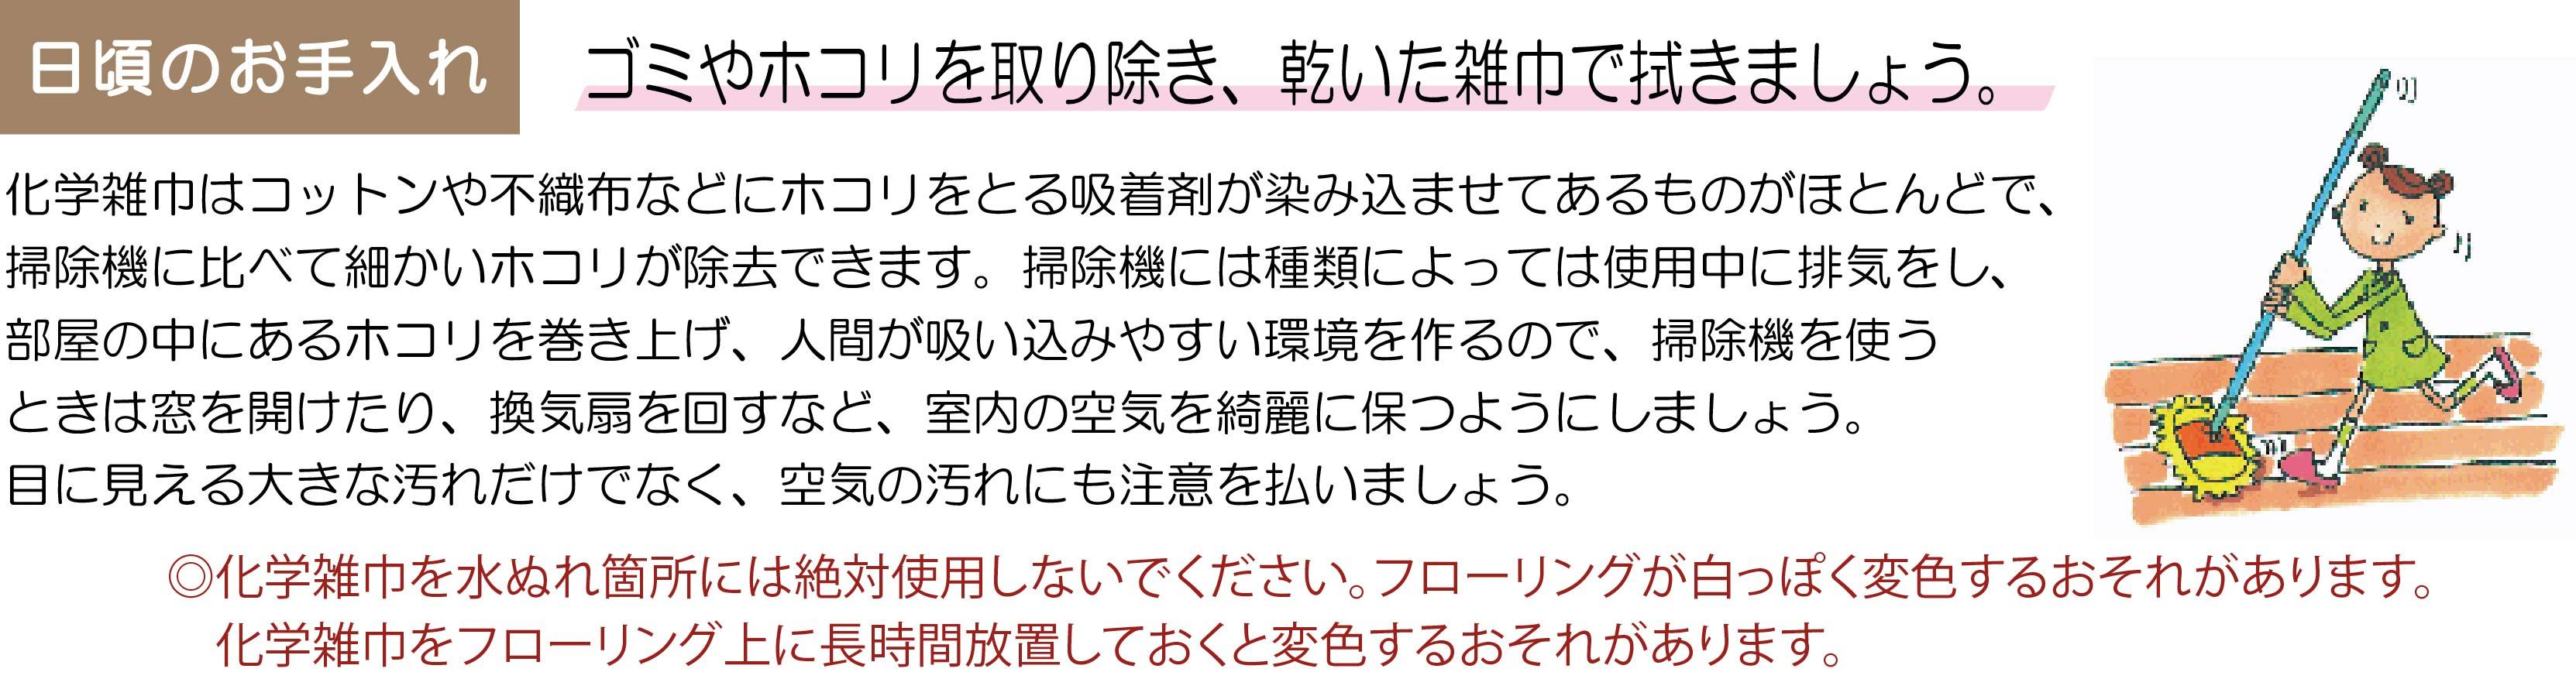 KuraSi-natu-sin85-16.jpg